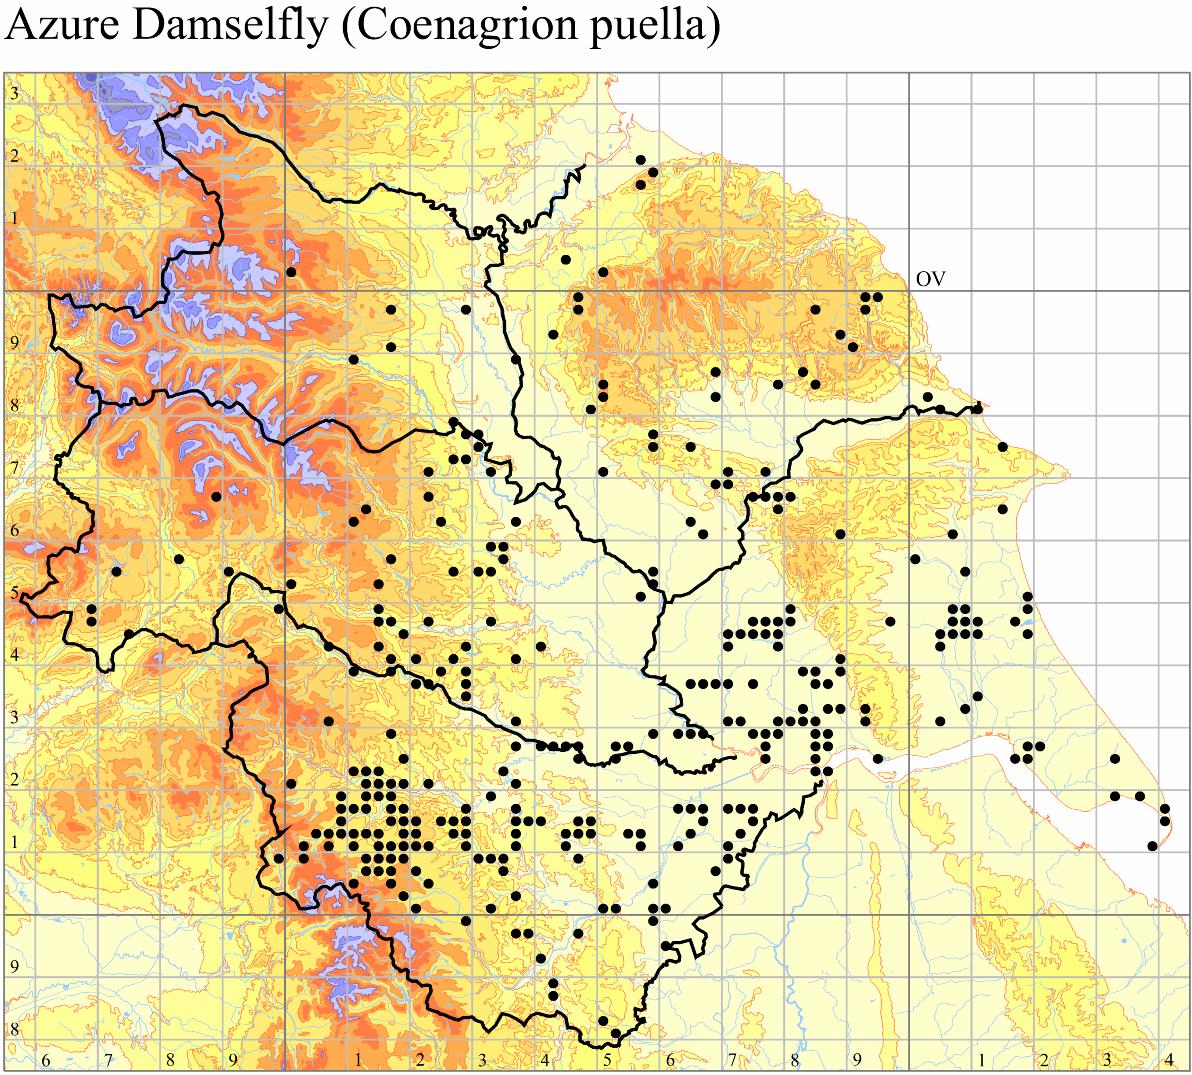 azure-damselfly-coenagrion-puella